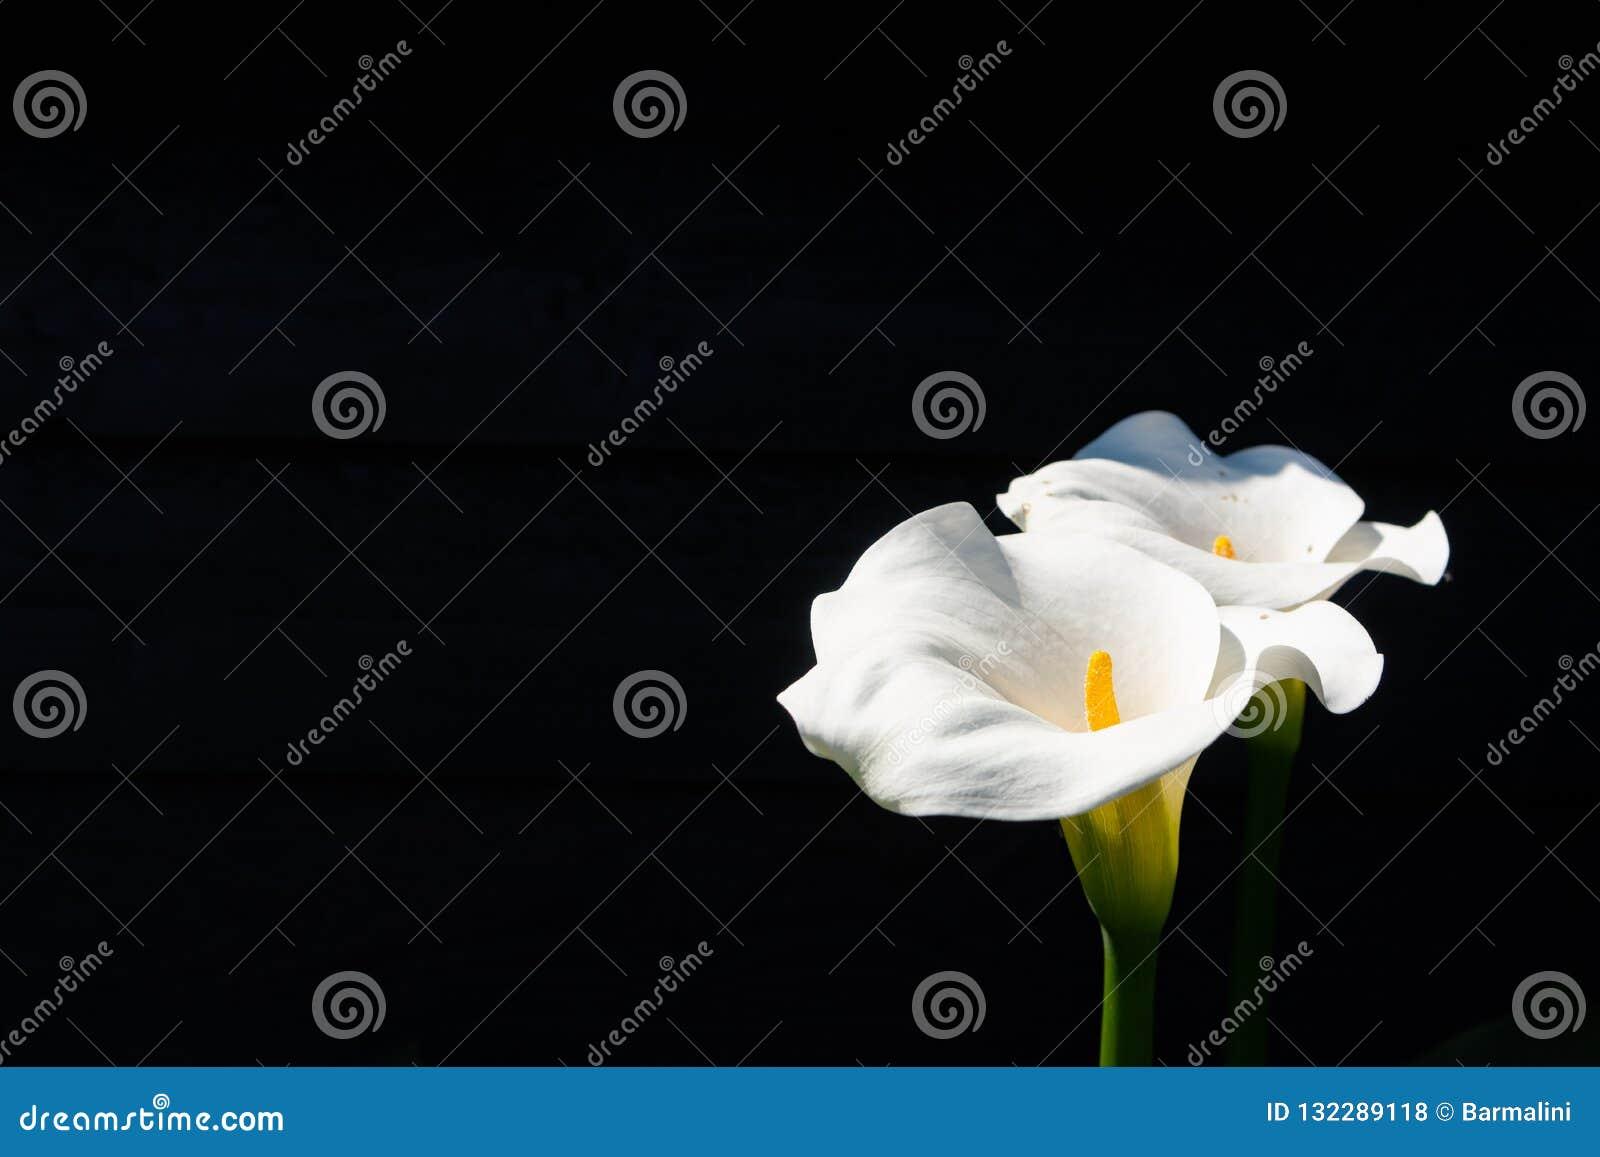 Planta branca do lírio de calla com as flores no fundo preto, KE escuro